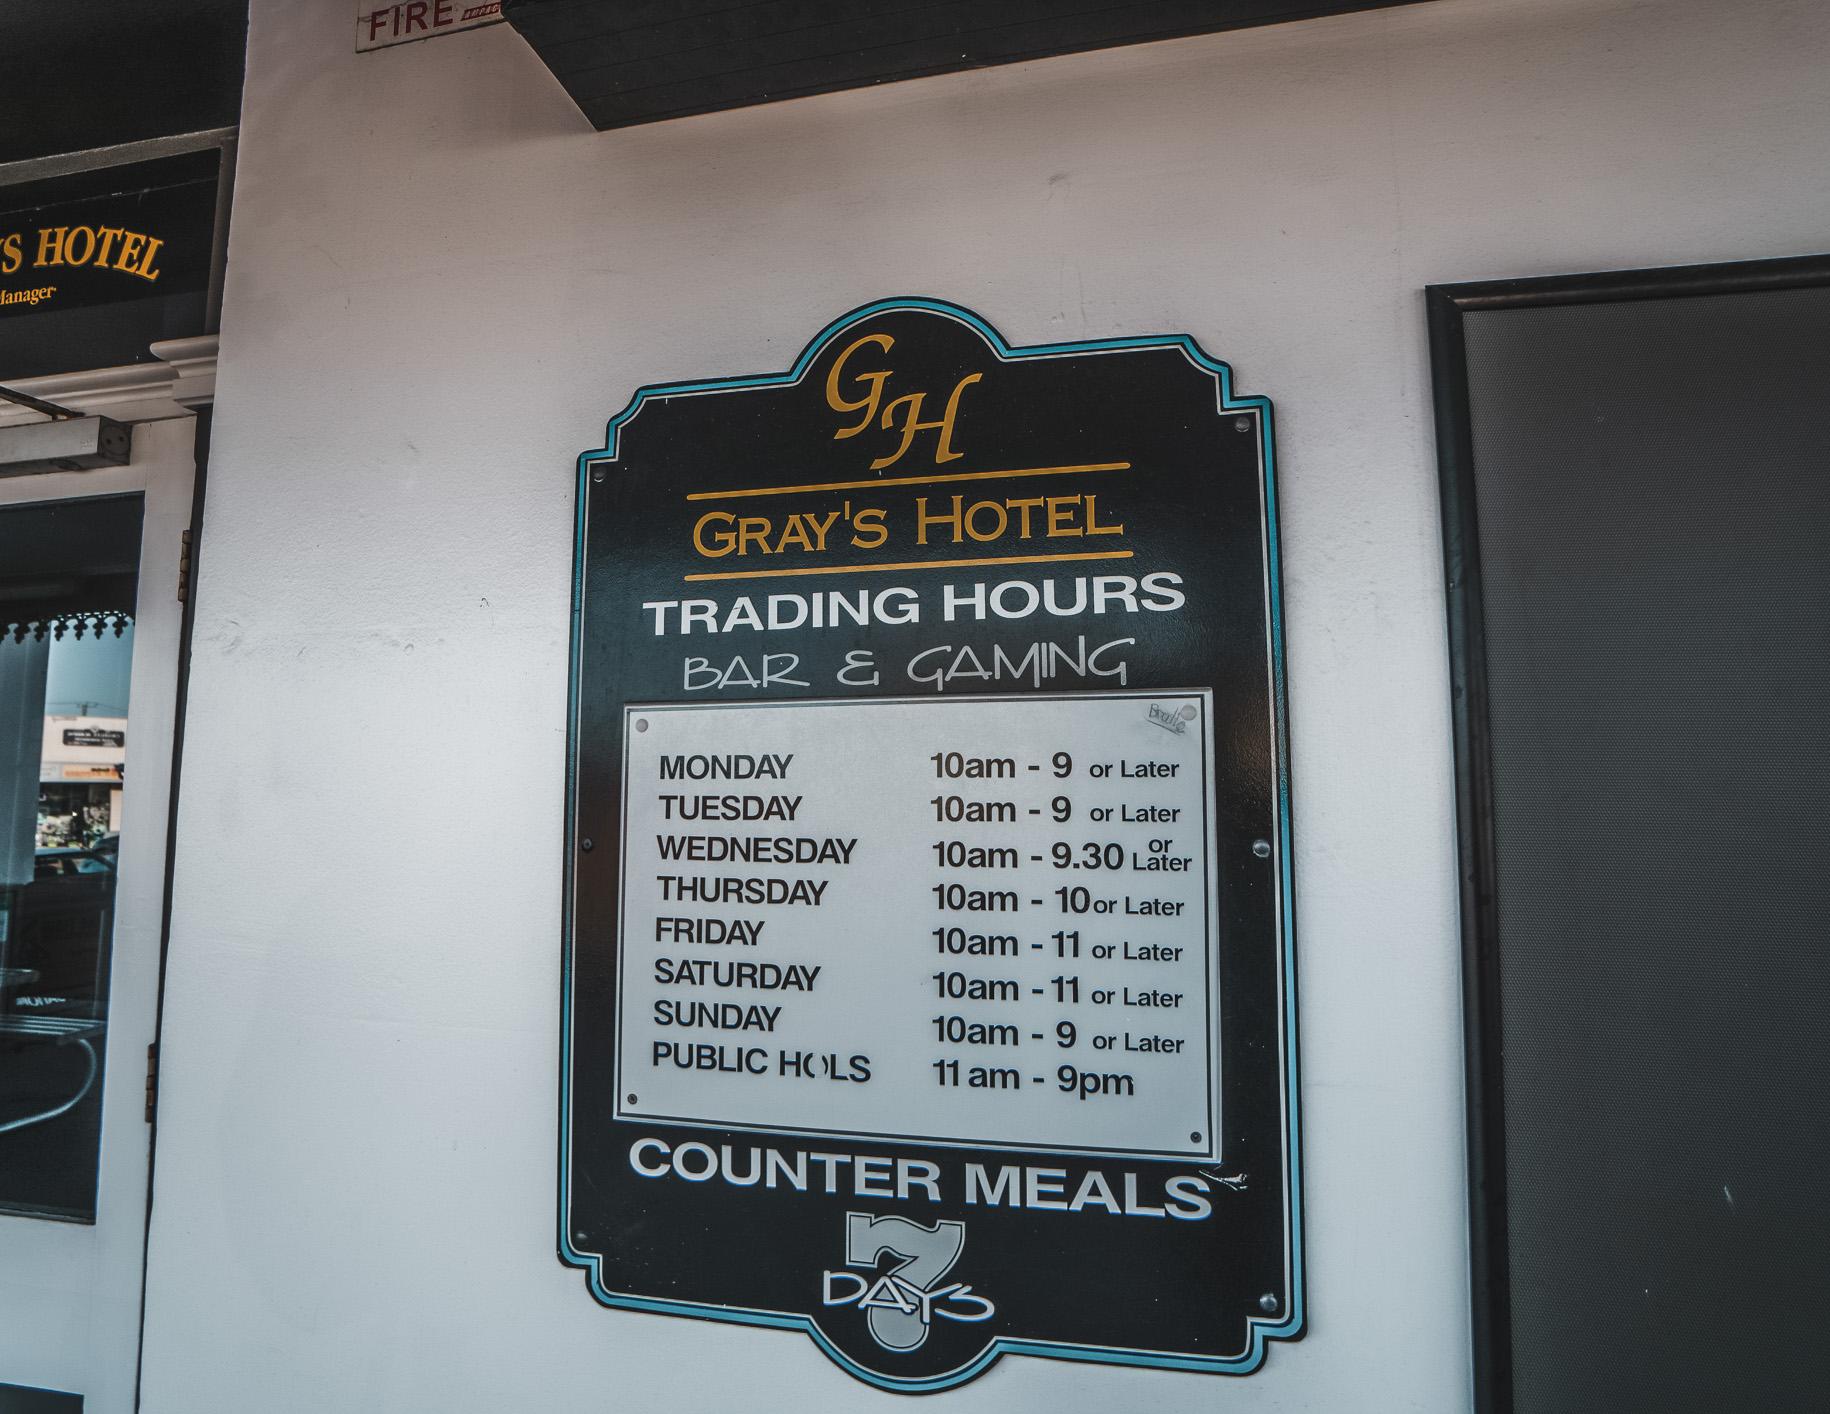 Gray's Hotel (Web) (14 of 16).jpg